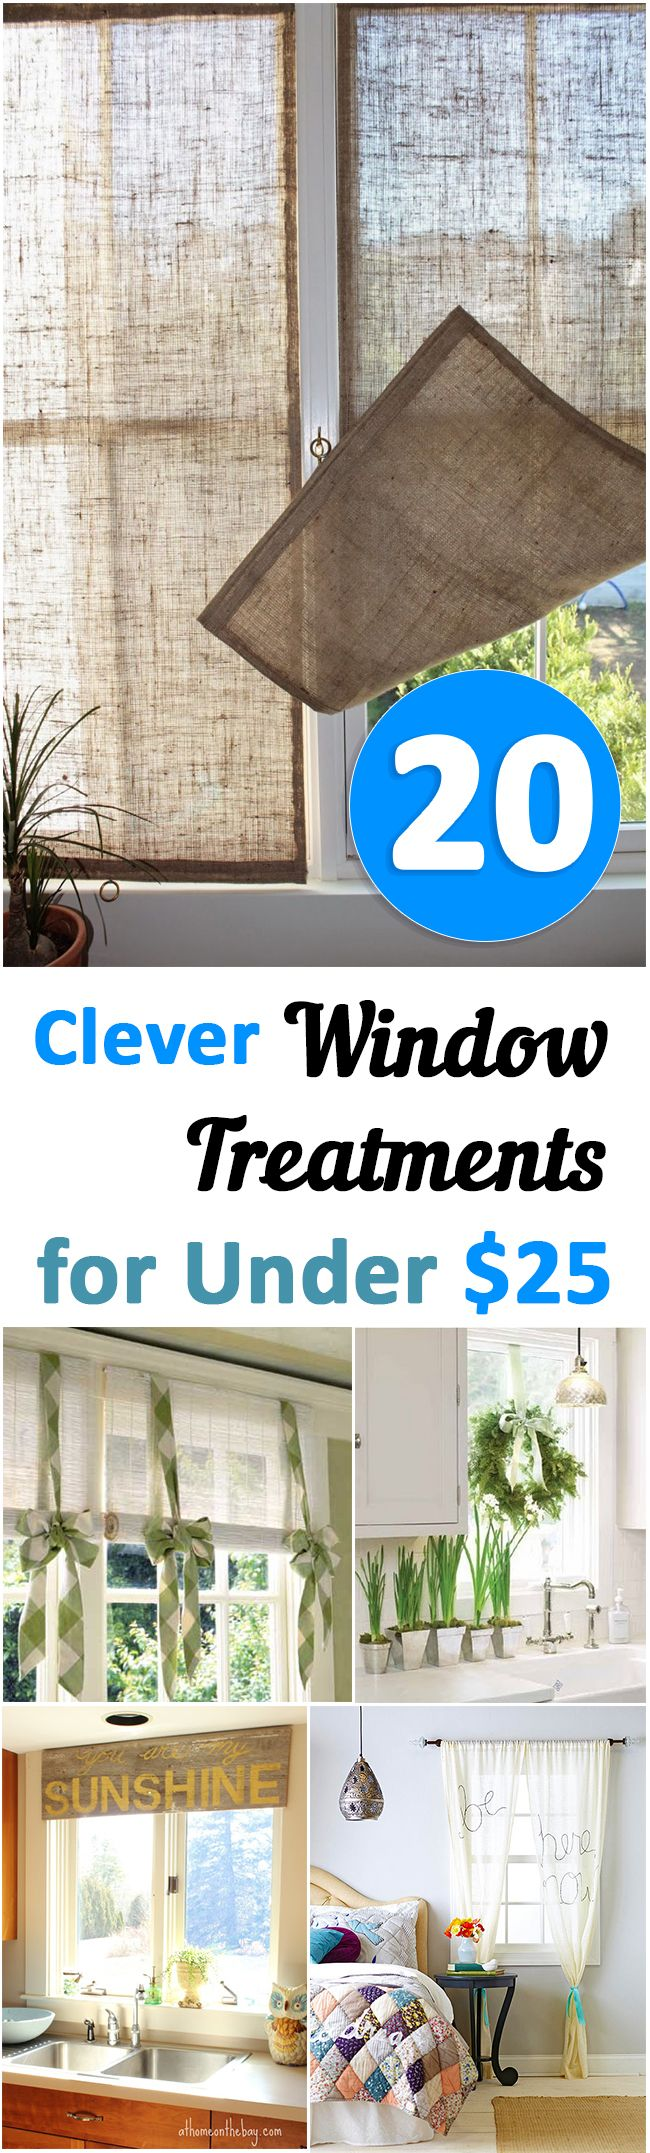 12 Clever Window Window Treatments for Under $12   Diy window ...